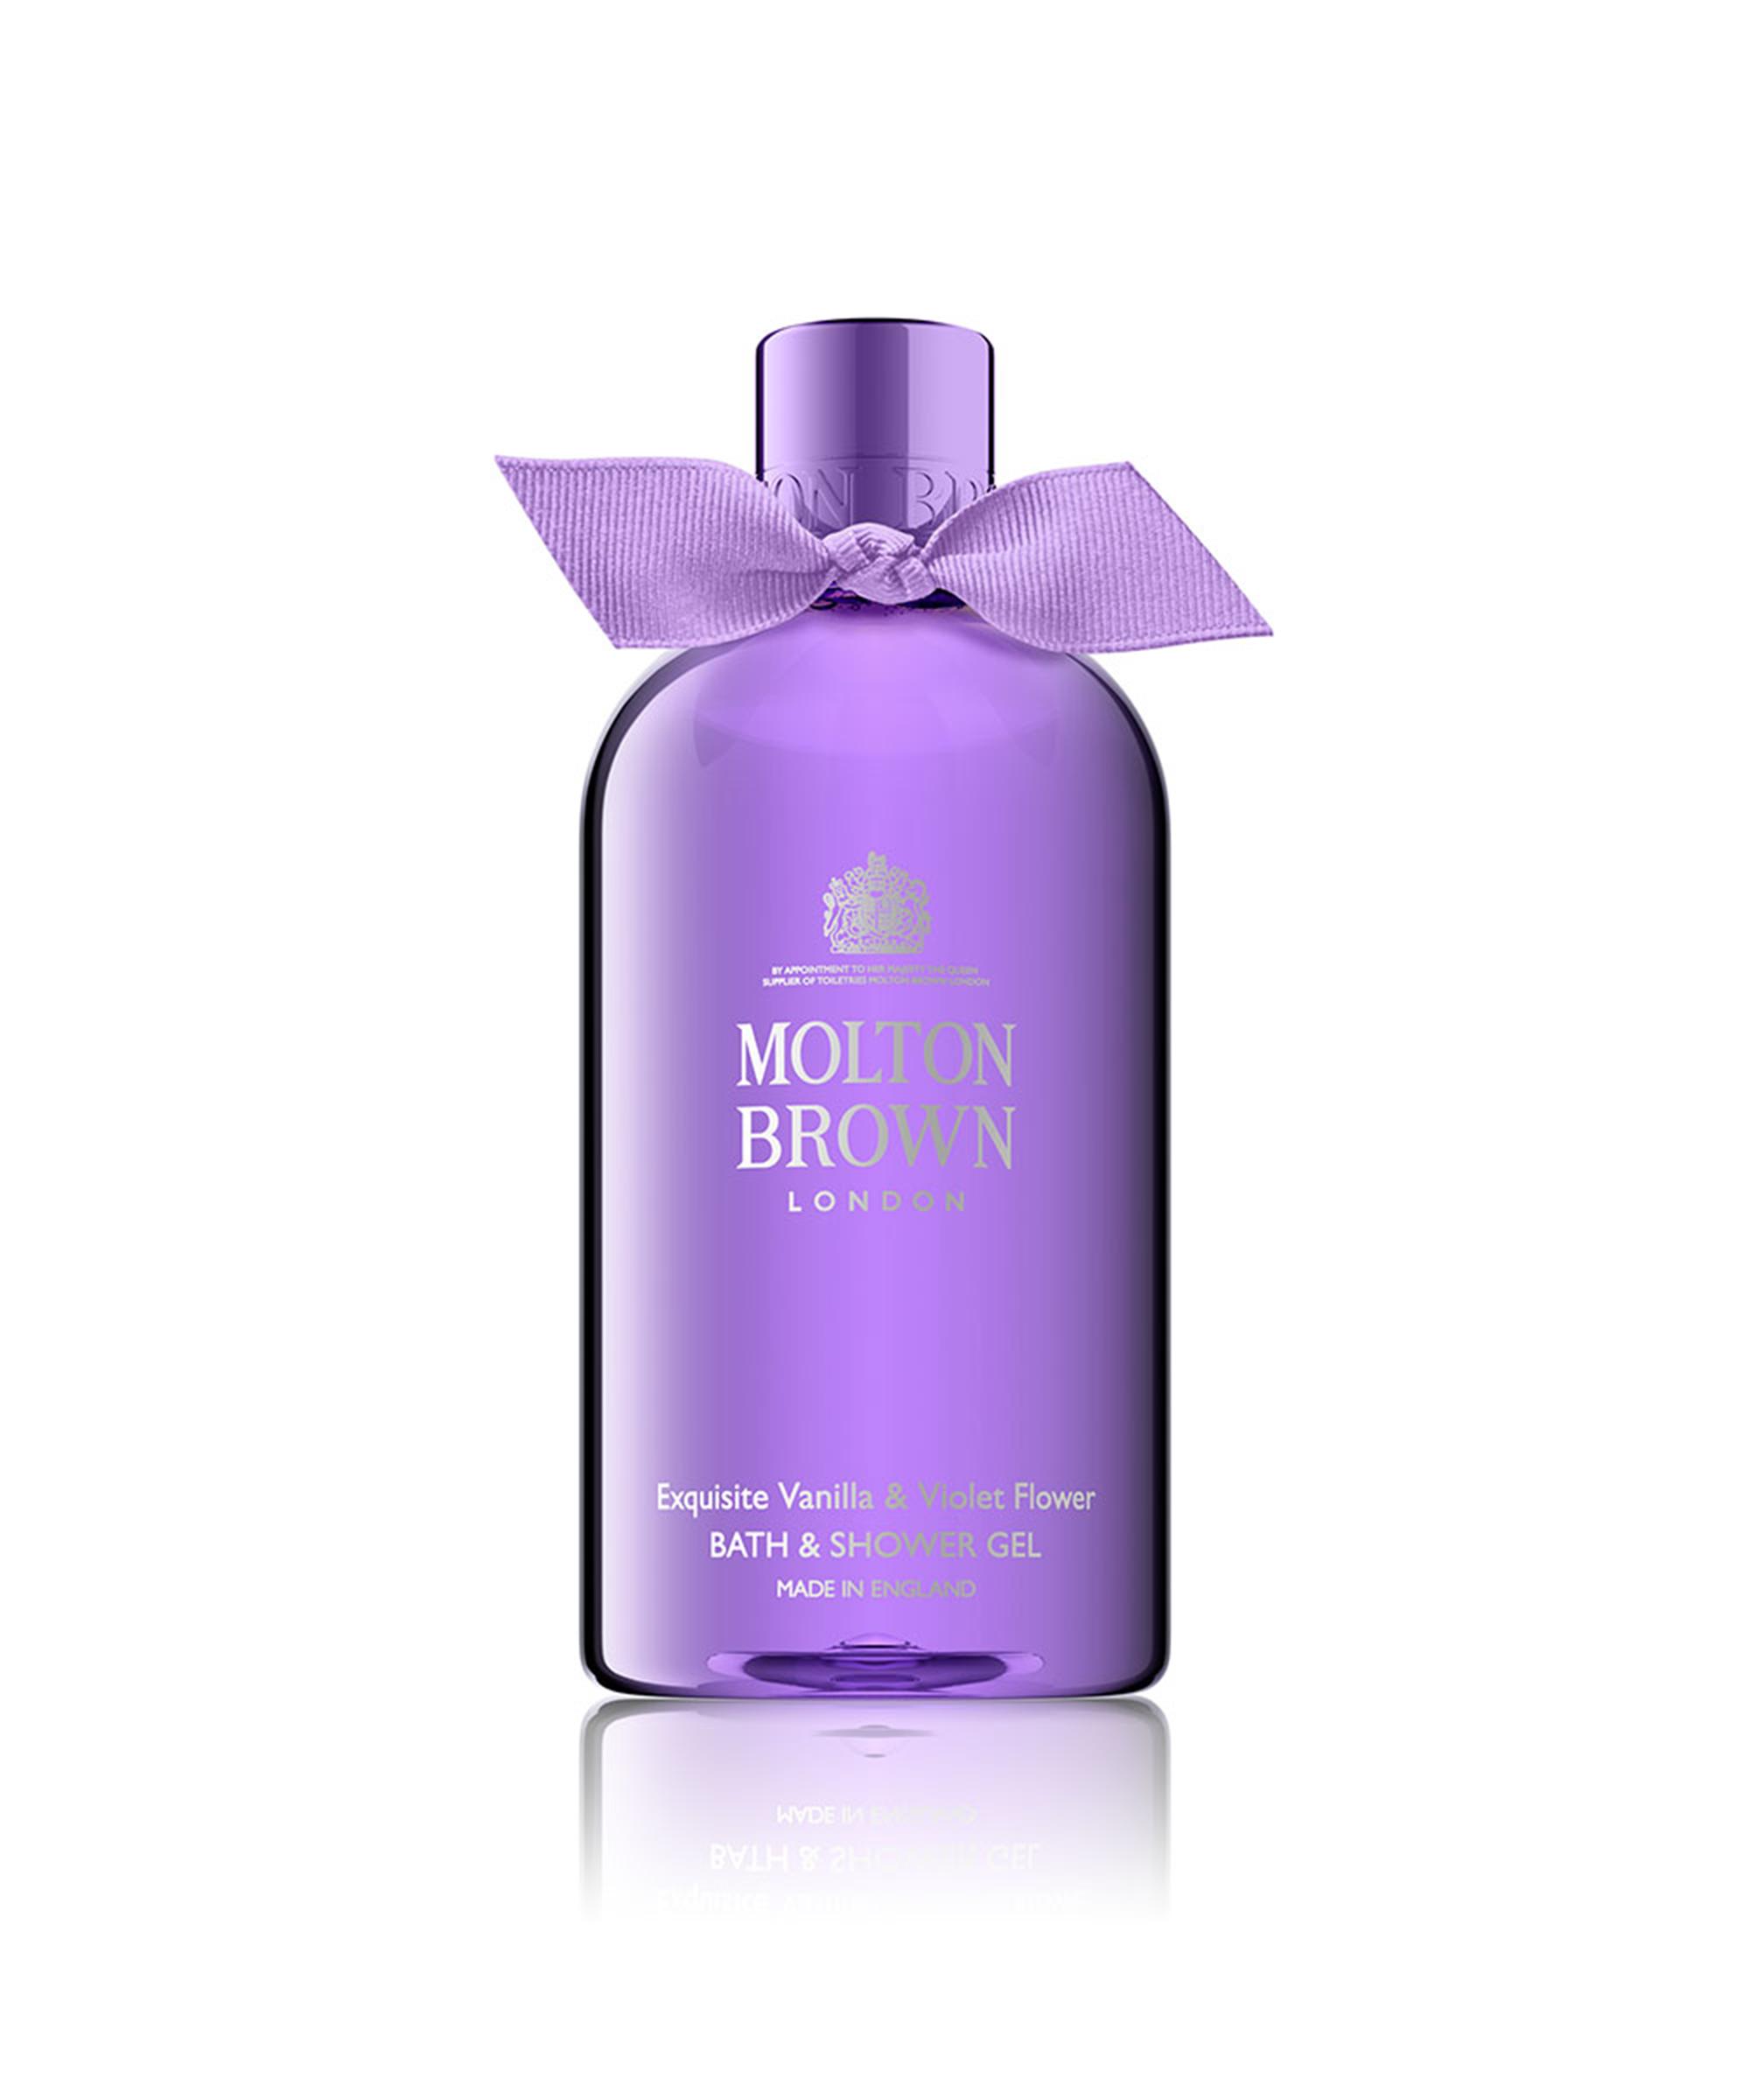 bath shampoo bnb best cinnamon sg cracker animal animalcracker frosted bubble smelling philosophy pink buns shower phl gel